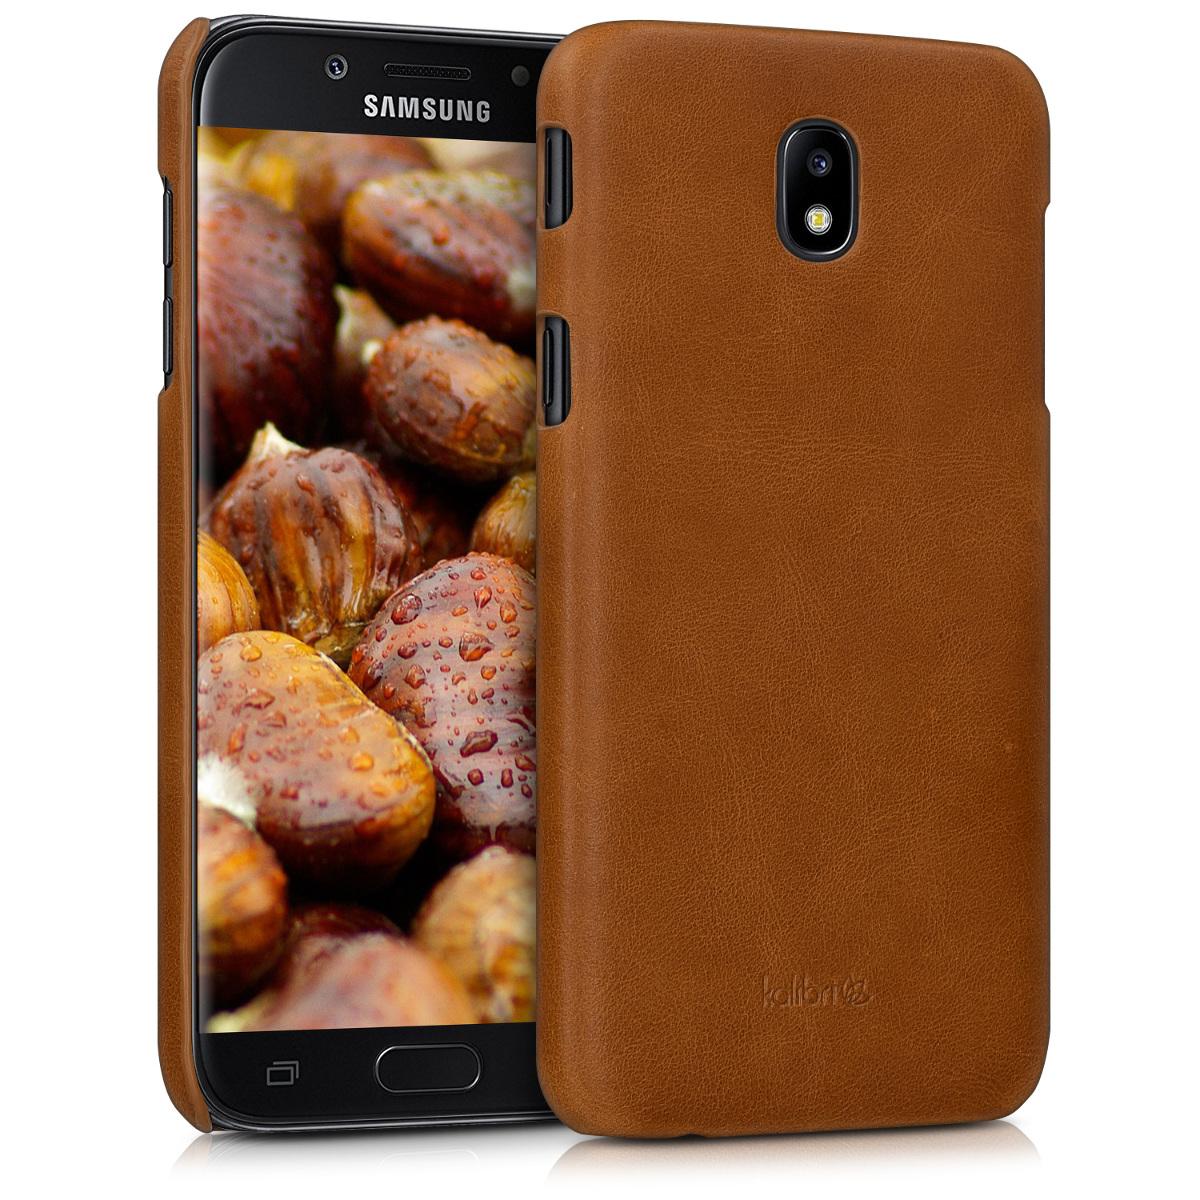 Kalibri Σκληρή Δερμάτινη Θήκη Samsung Galaxy J5 2017 - Cognac (43334.83)